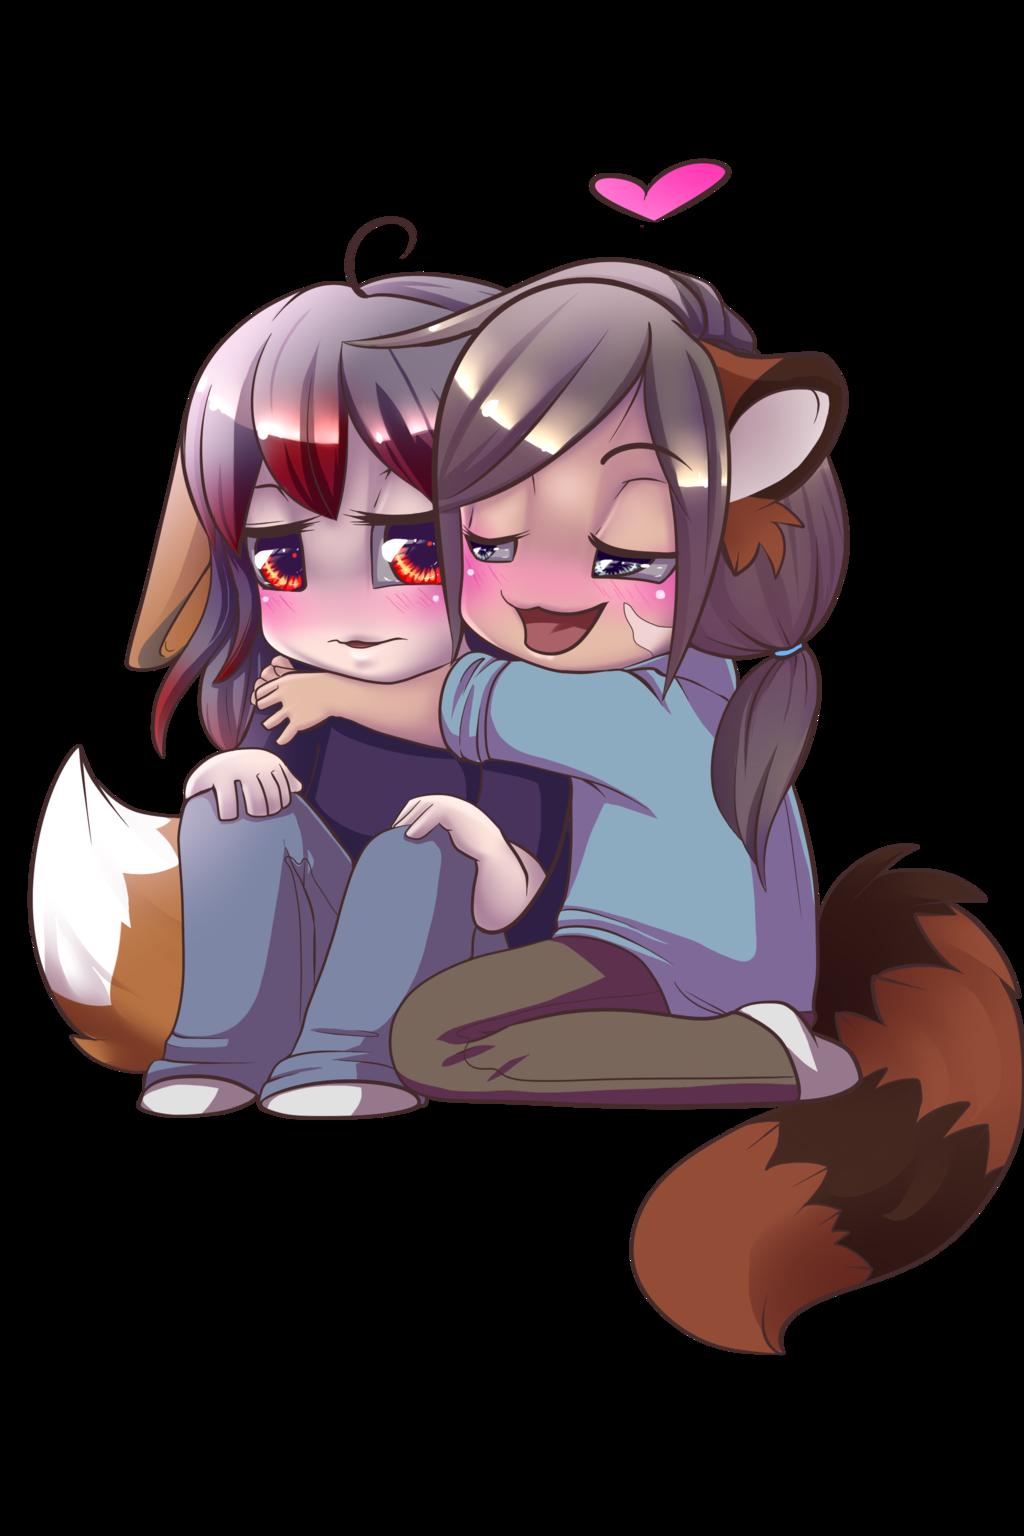 Commission: Chibi snuggles